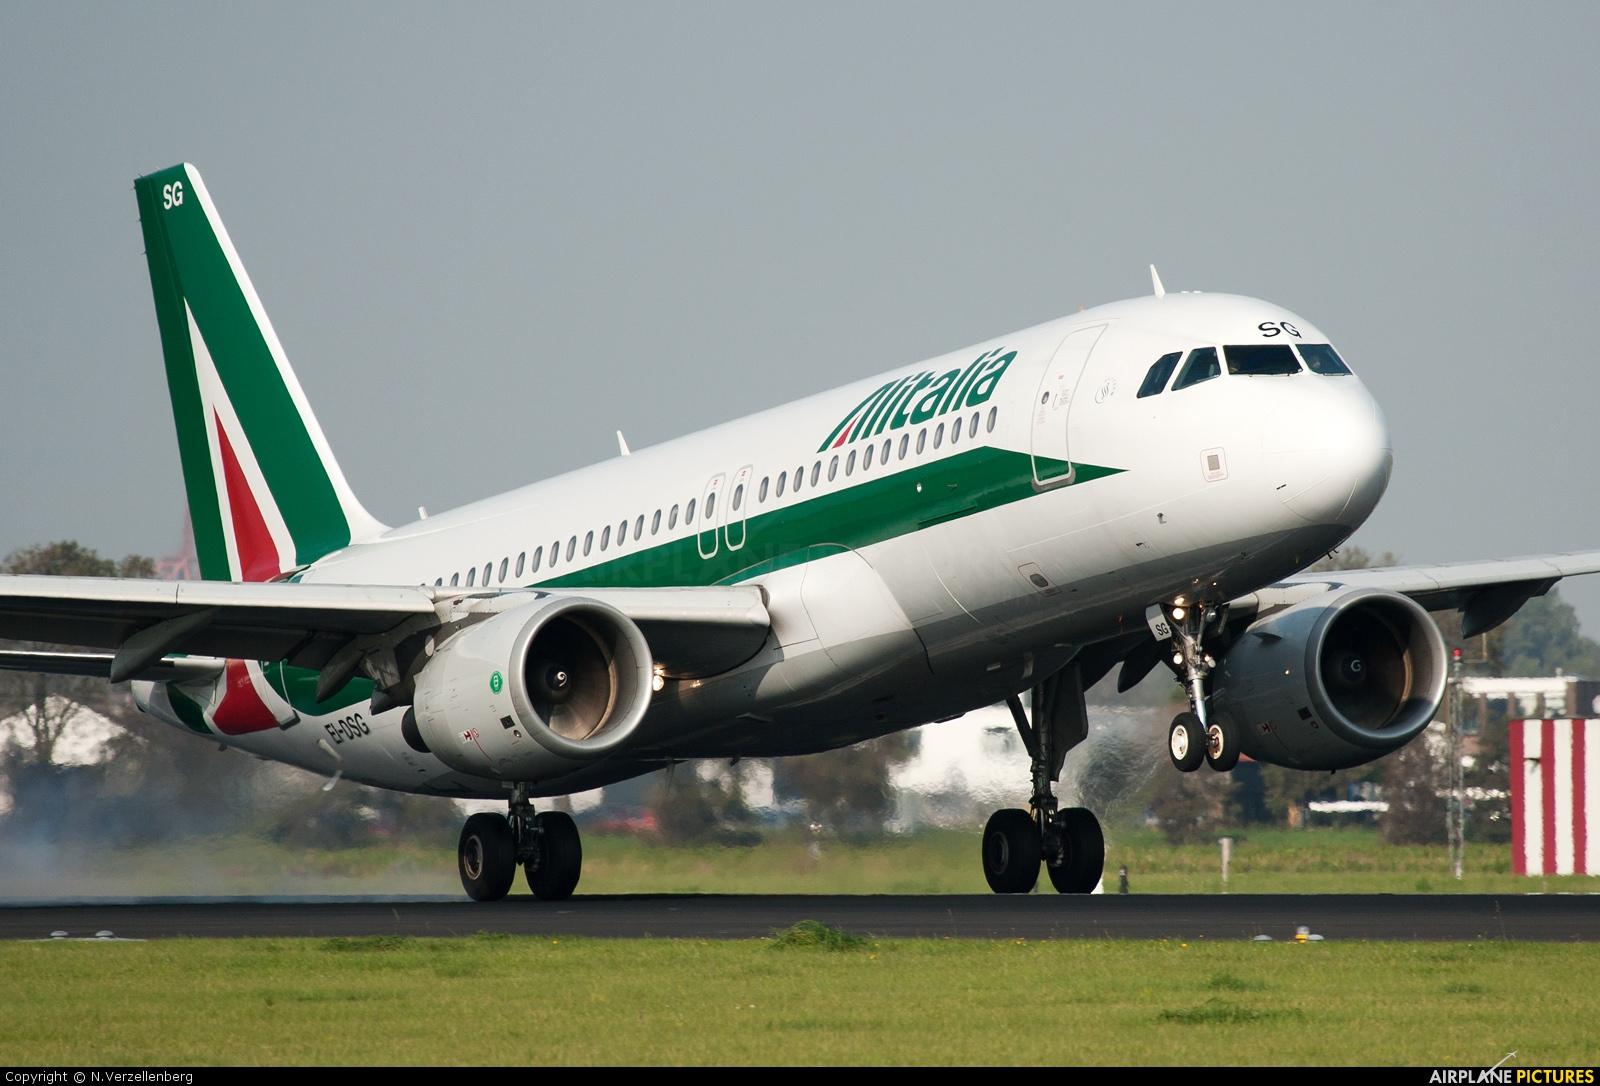 Alitalia foto boeing 777 alitalia 71